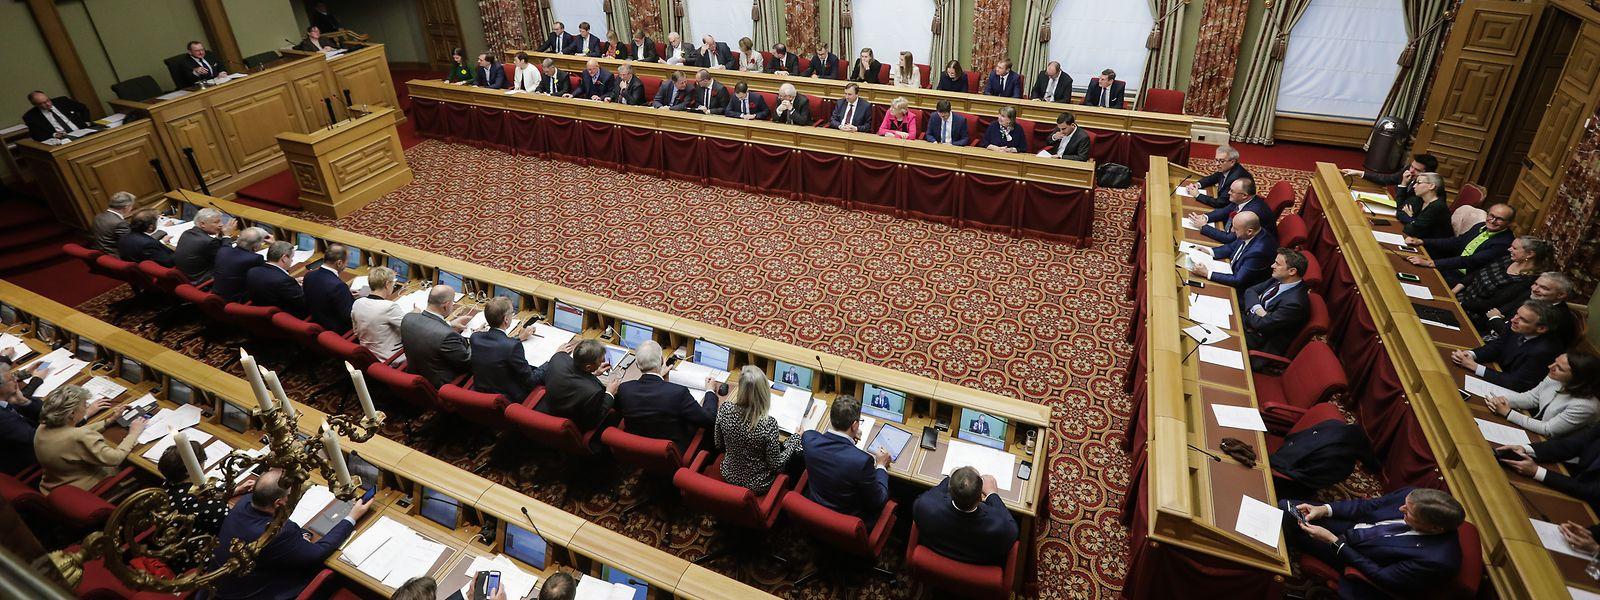 Laurent Scheeck soll neuer Generalsekretär des Parlaments werden.